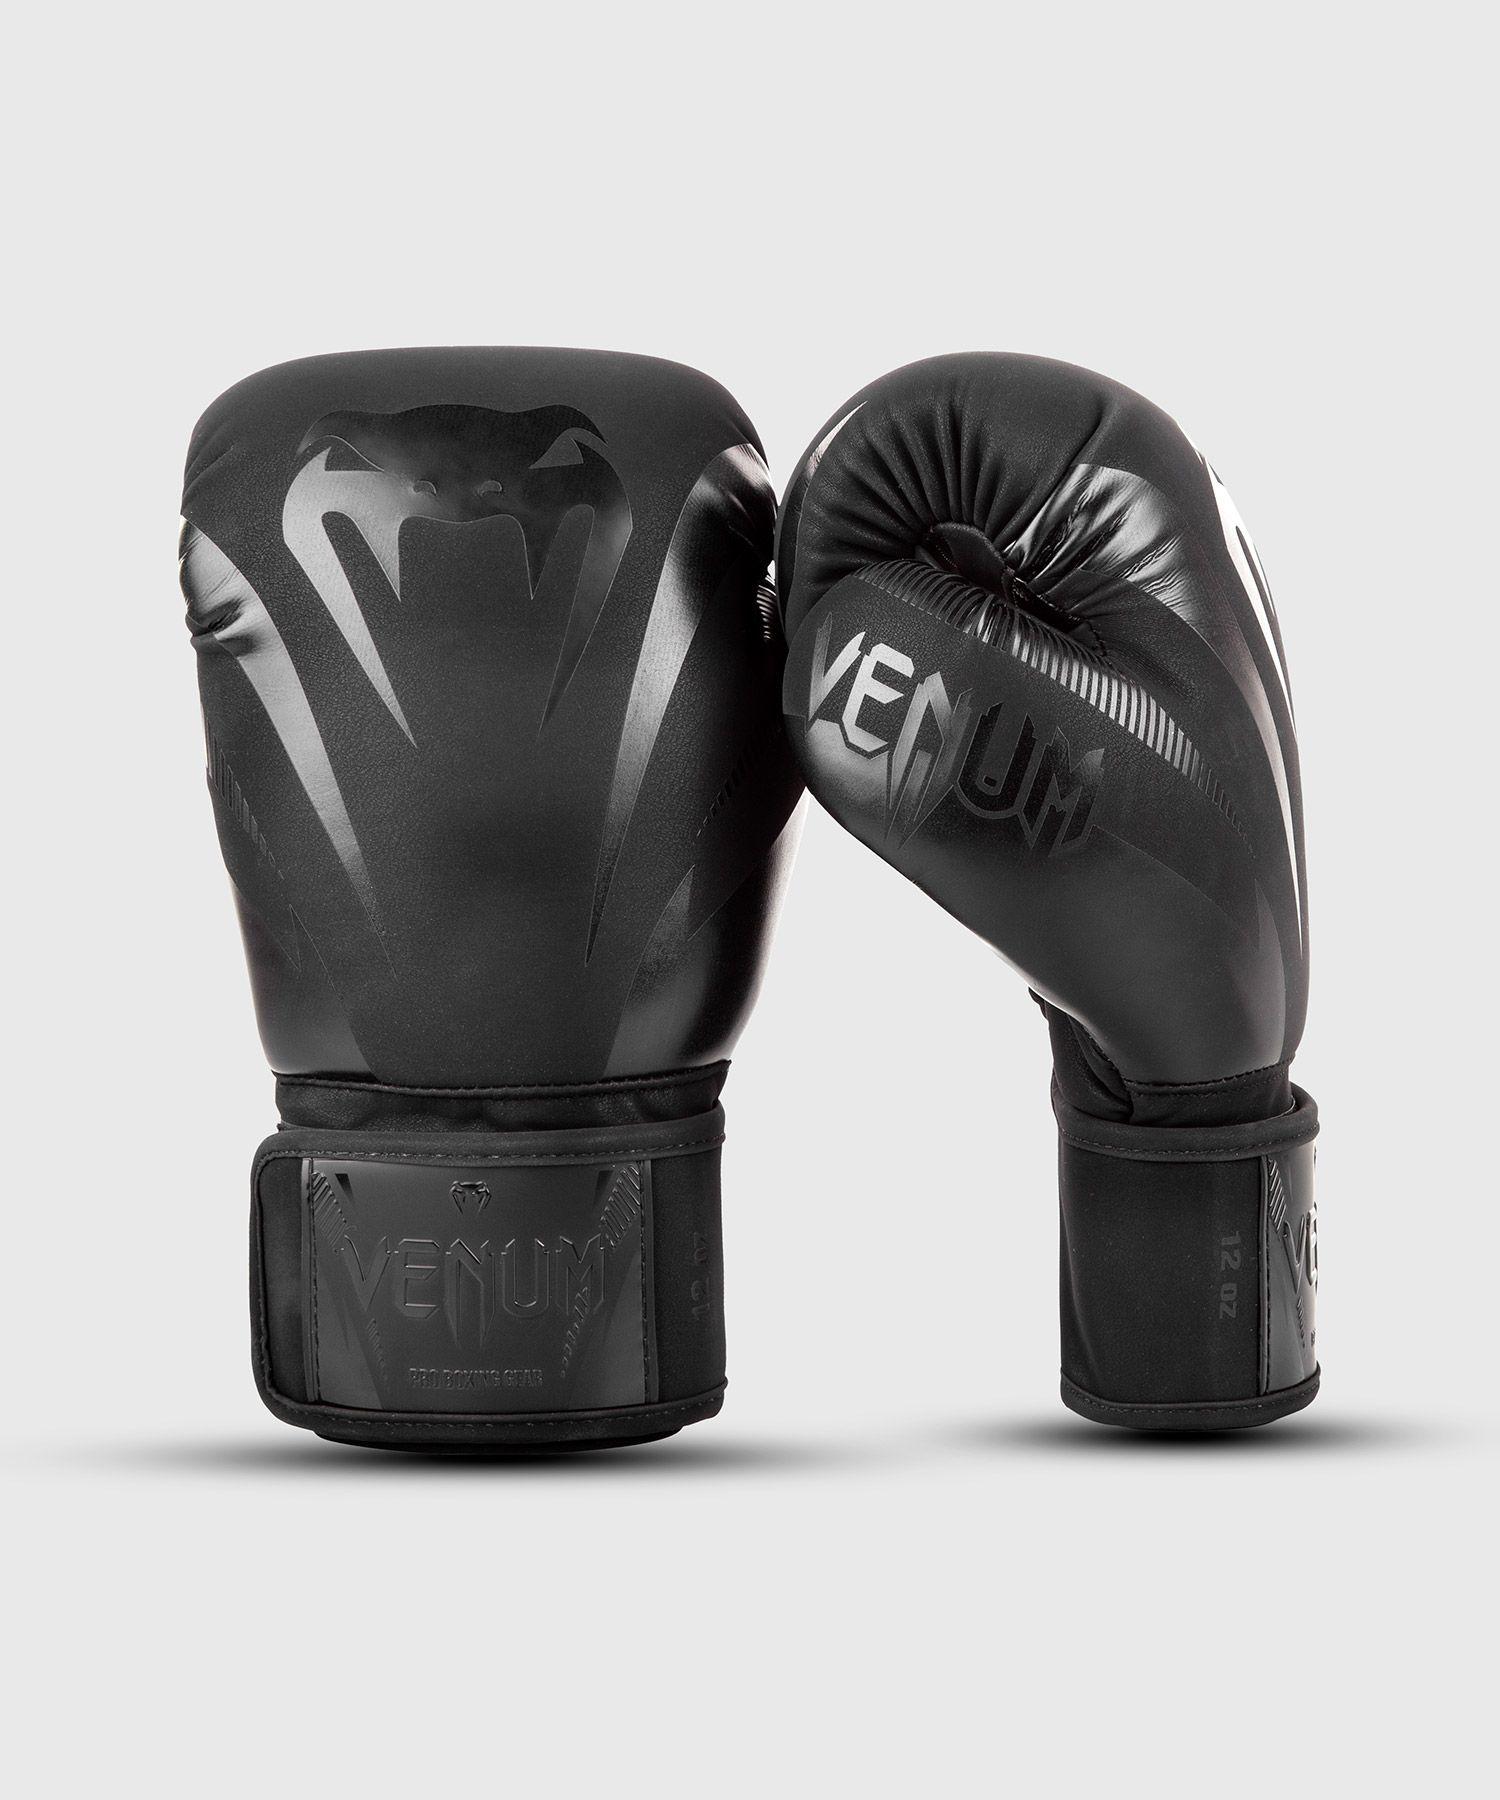 Venum Impact Boxing Gloves - Black/Black